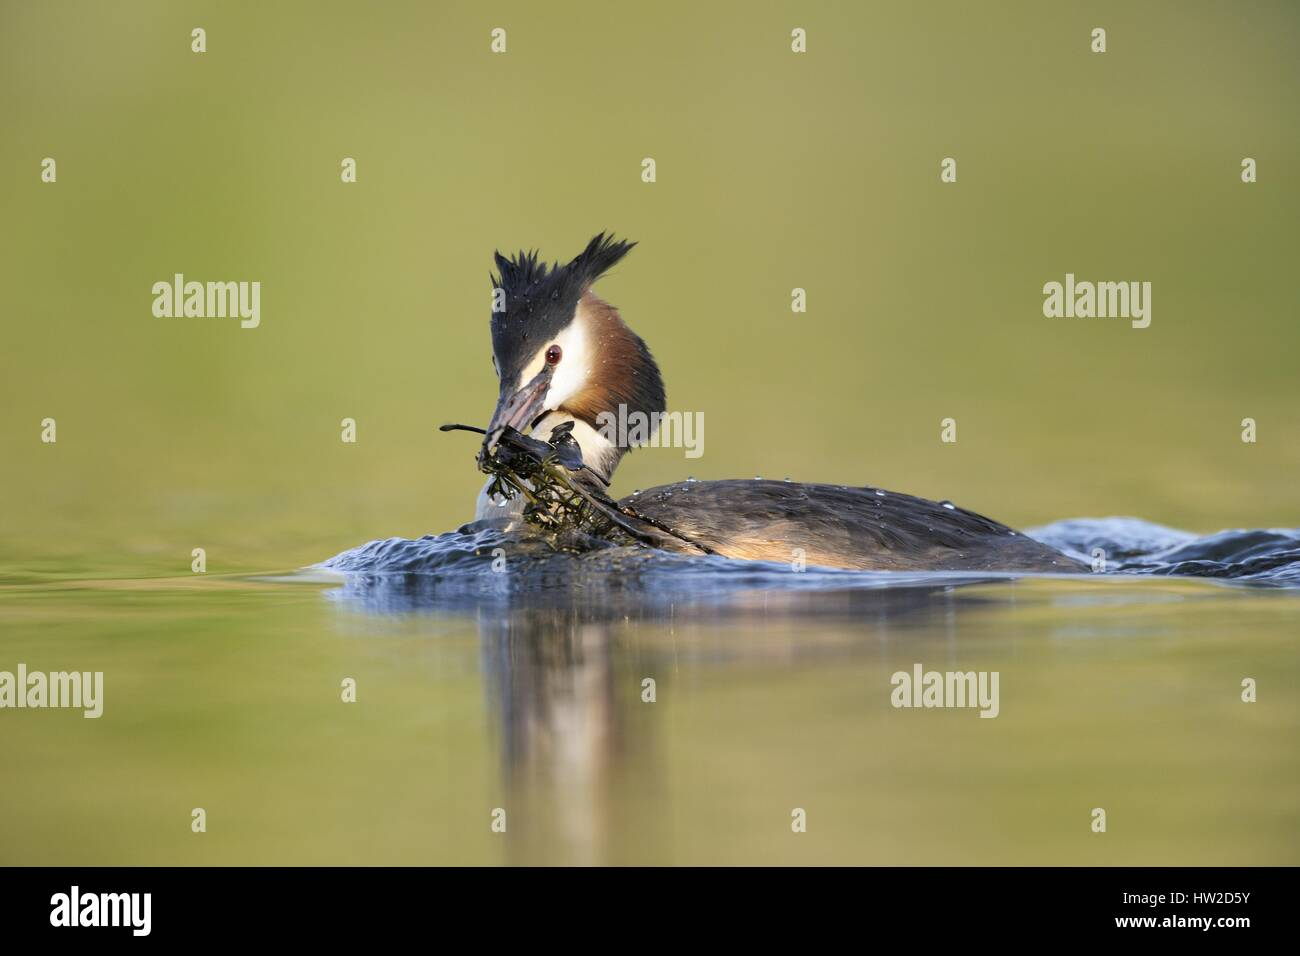 animal animals - Stock Image